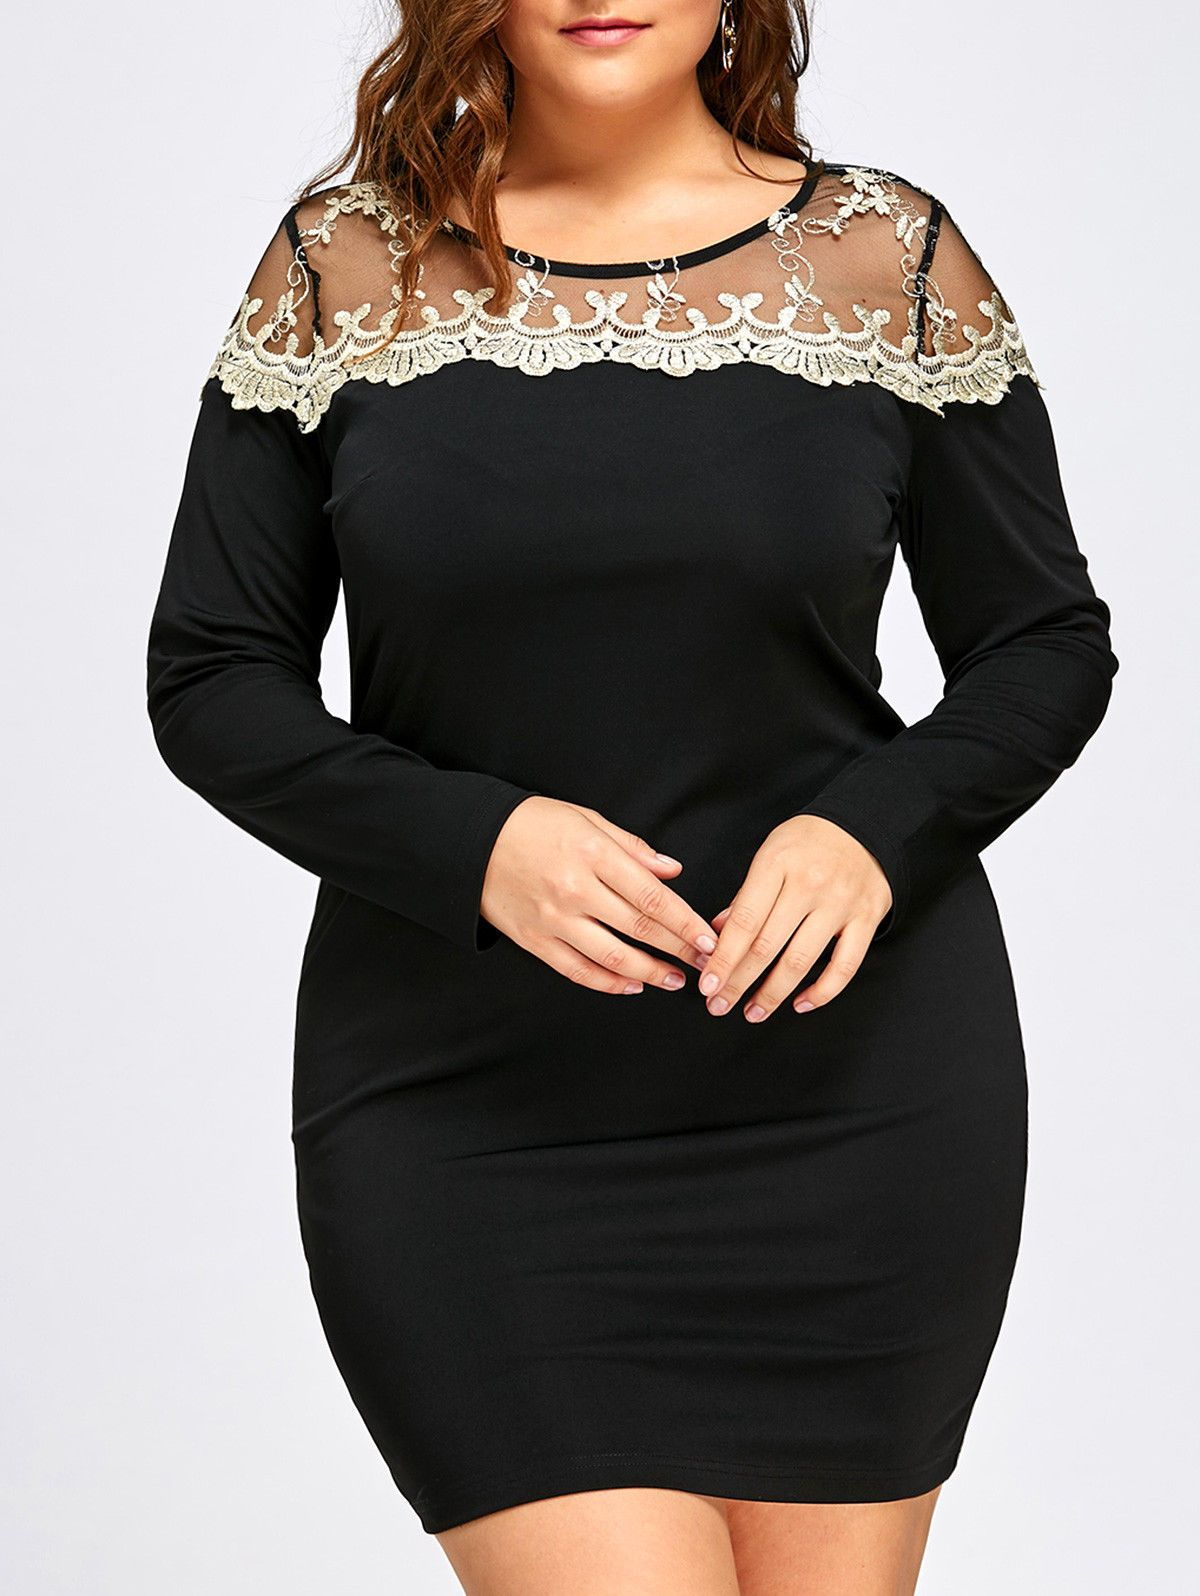 fe1d61c08c263  13.29 - Plus Size Xl-5Xl Women Dress Mesh Lace Insert Mini Bodycon Evening  Party Dress  ebay  Fashion